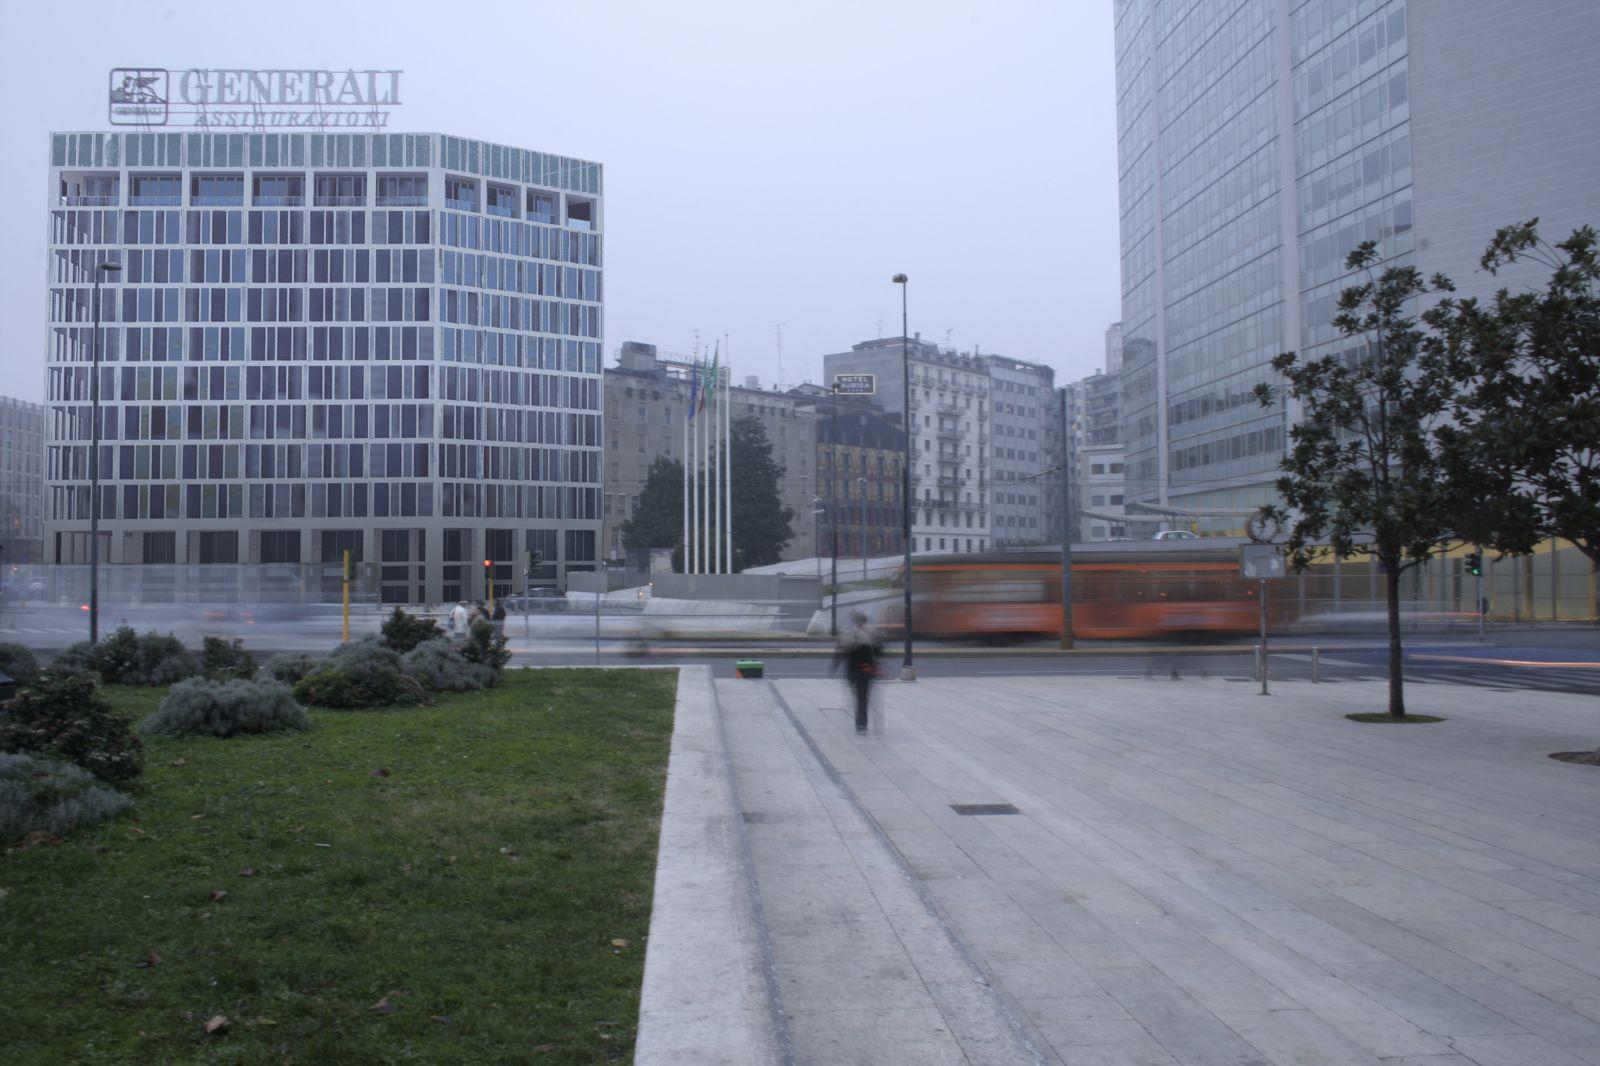 Office Building - Stazione Centrale Milan 470